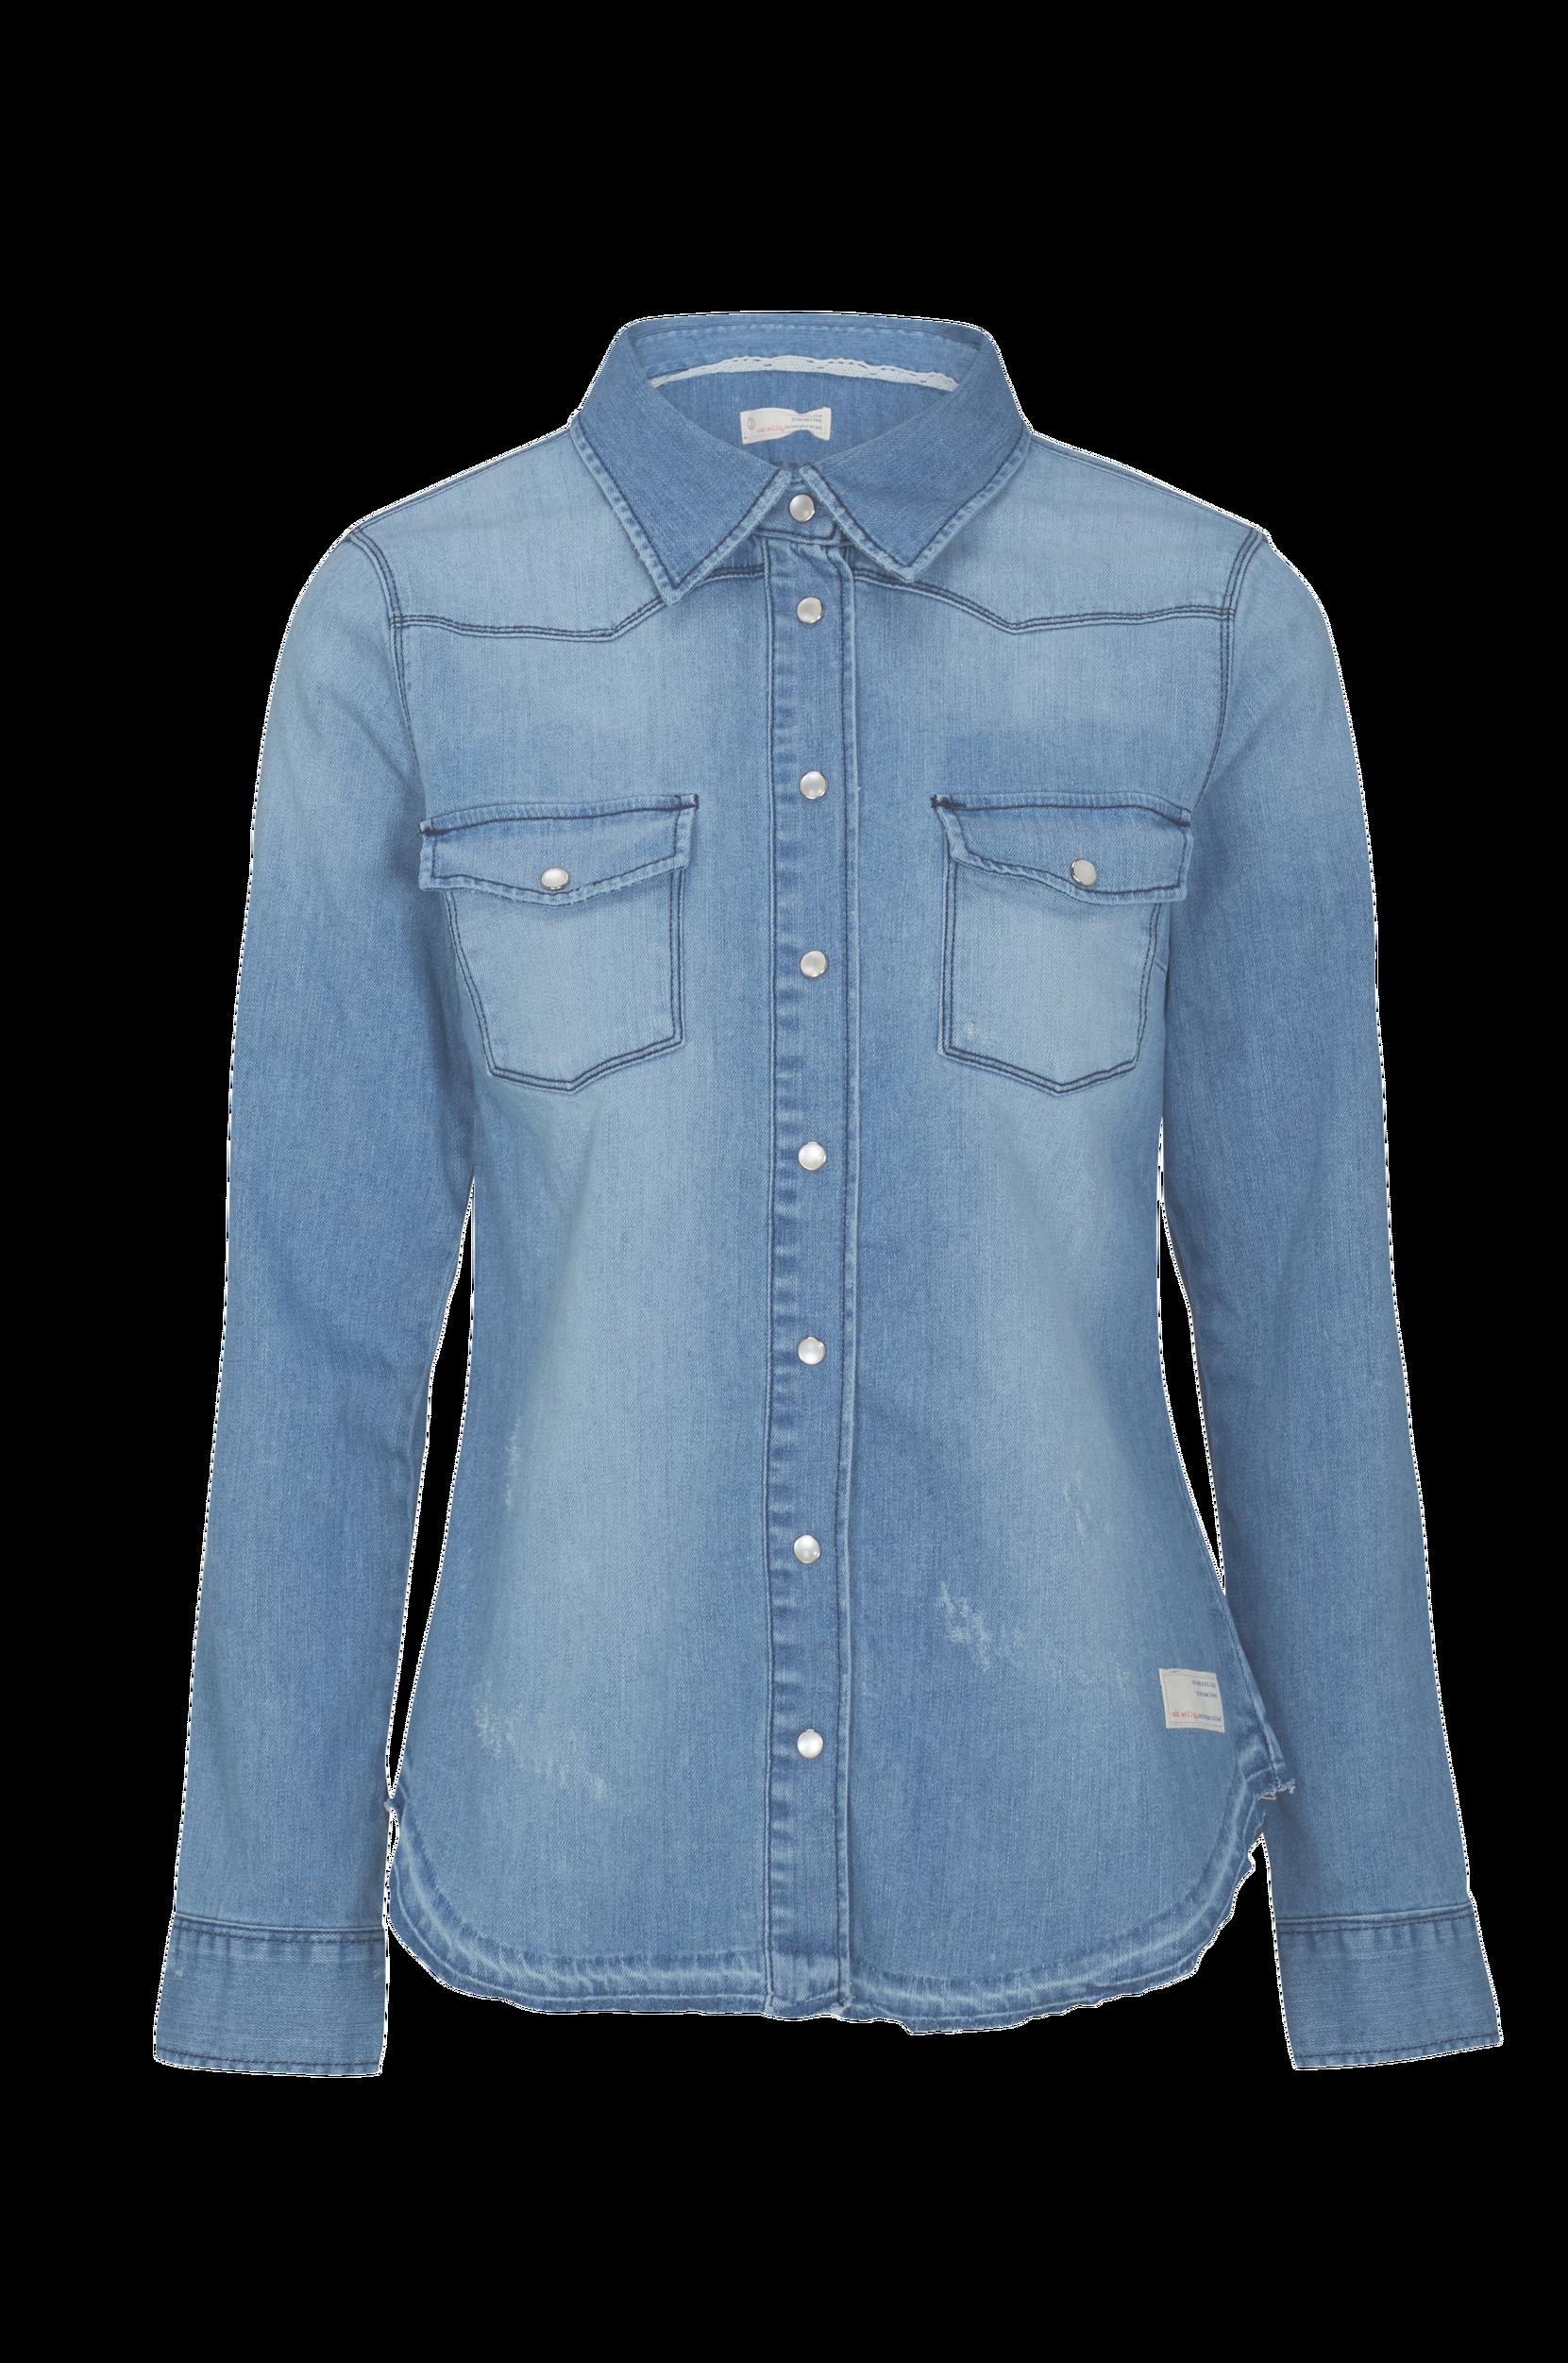 Denimskjorte Dress Up Odd Molly Skjorter & bluser til Kvinder i Mellemblå